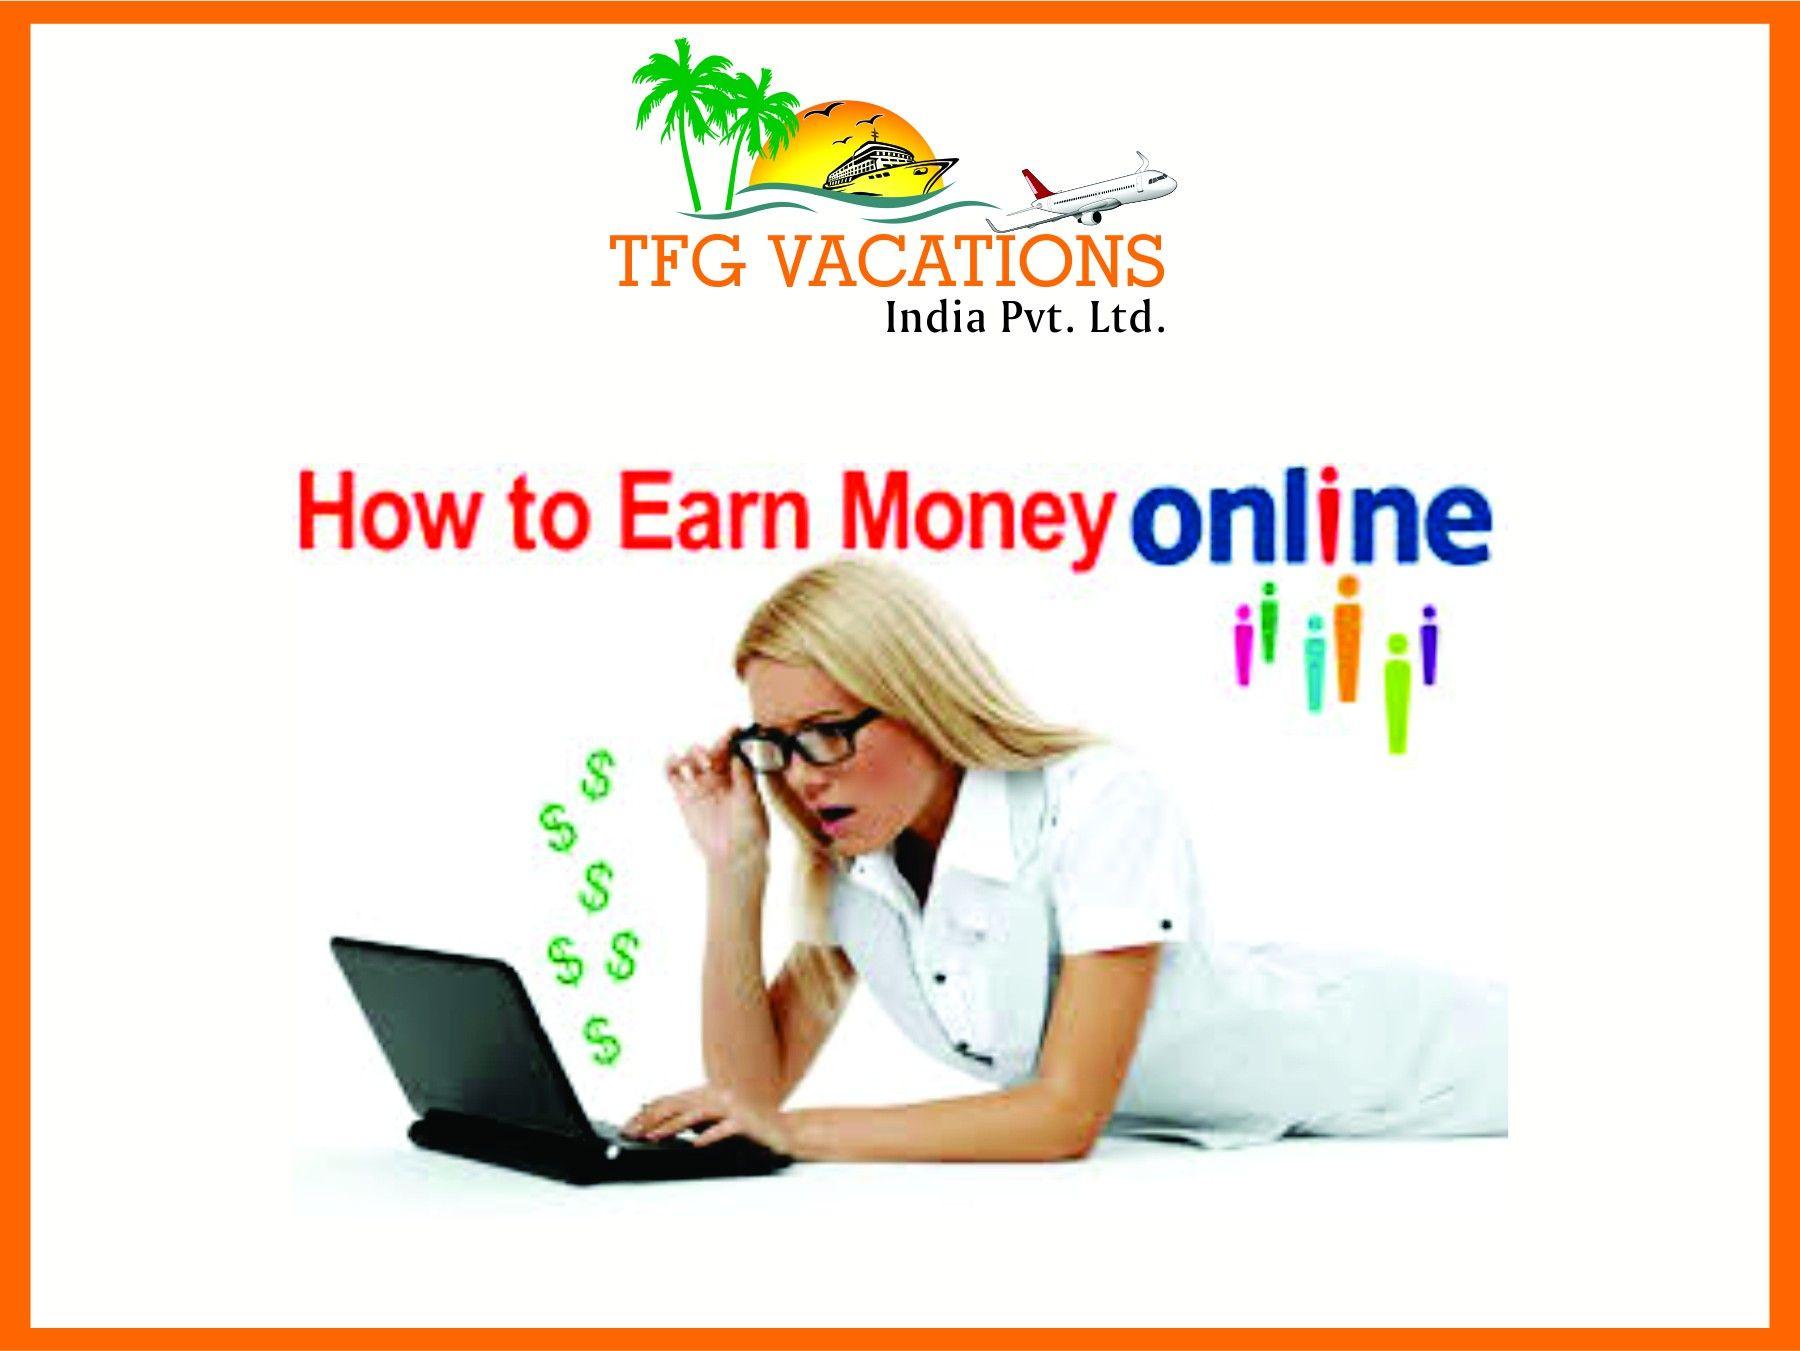 Home Based Work- Online Tourism Promotion$$$